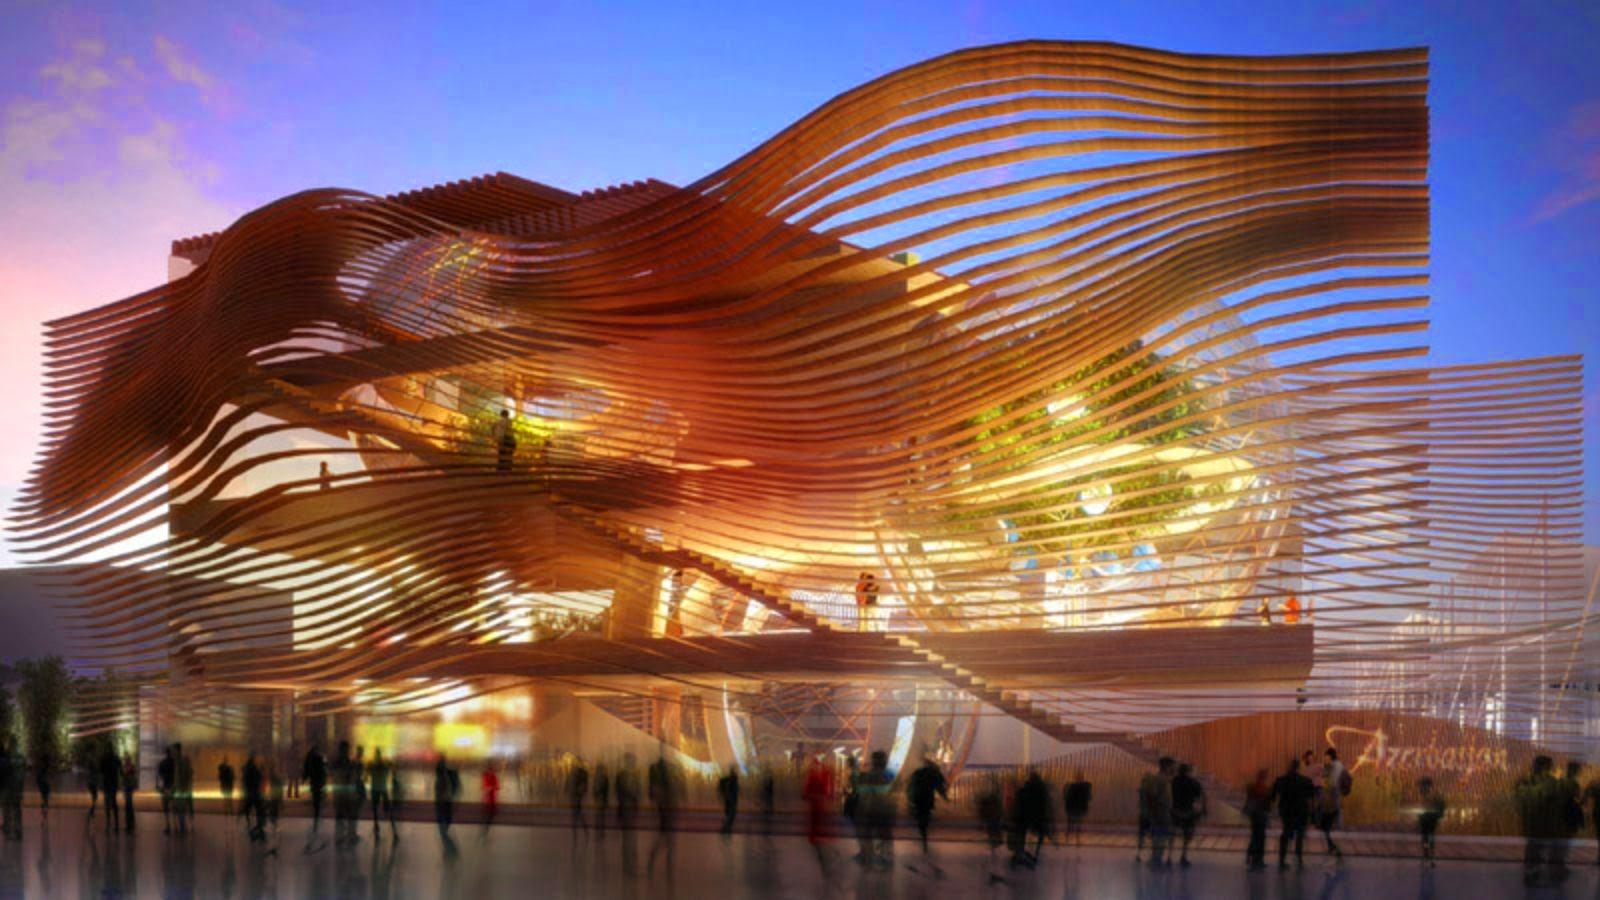 Expo padiglioni for Tutti i padiglioni expo 2015